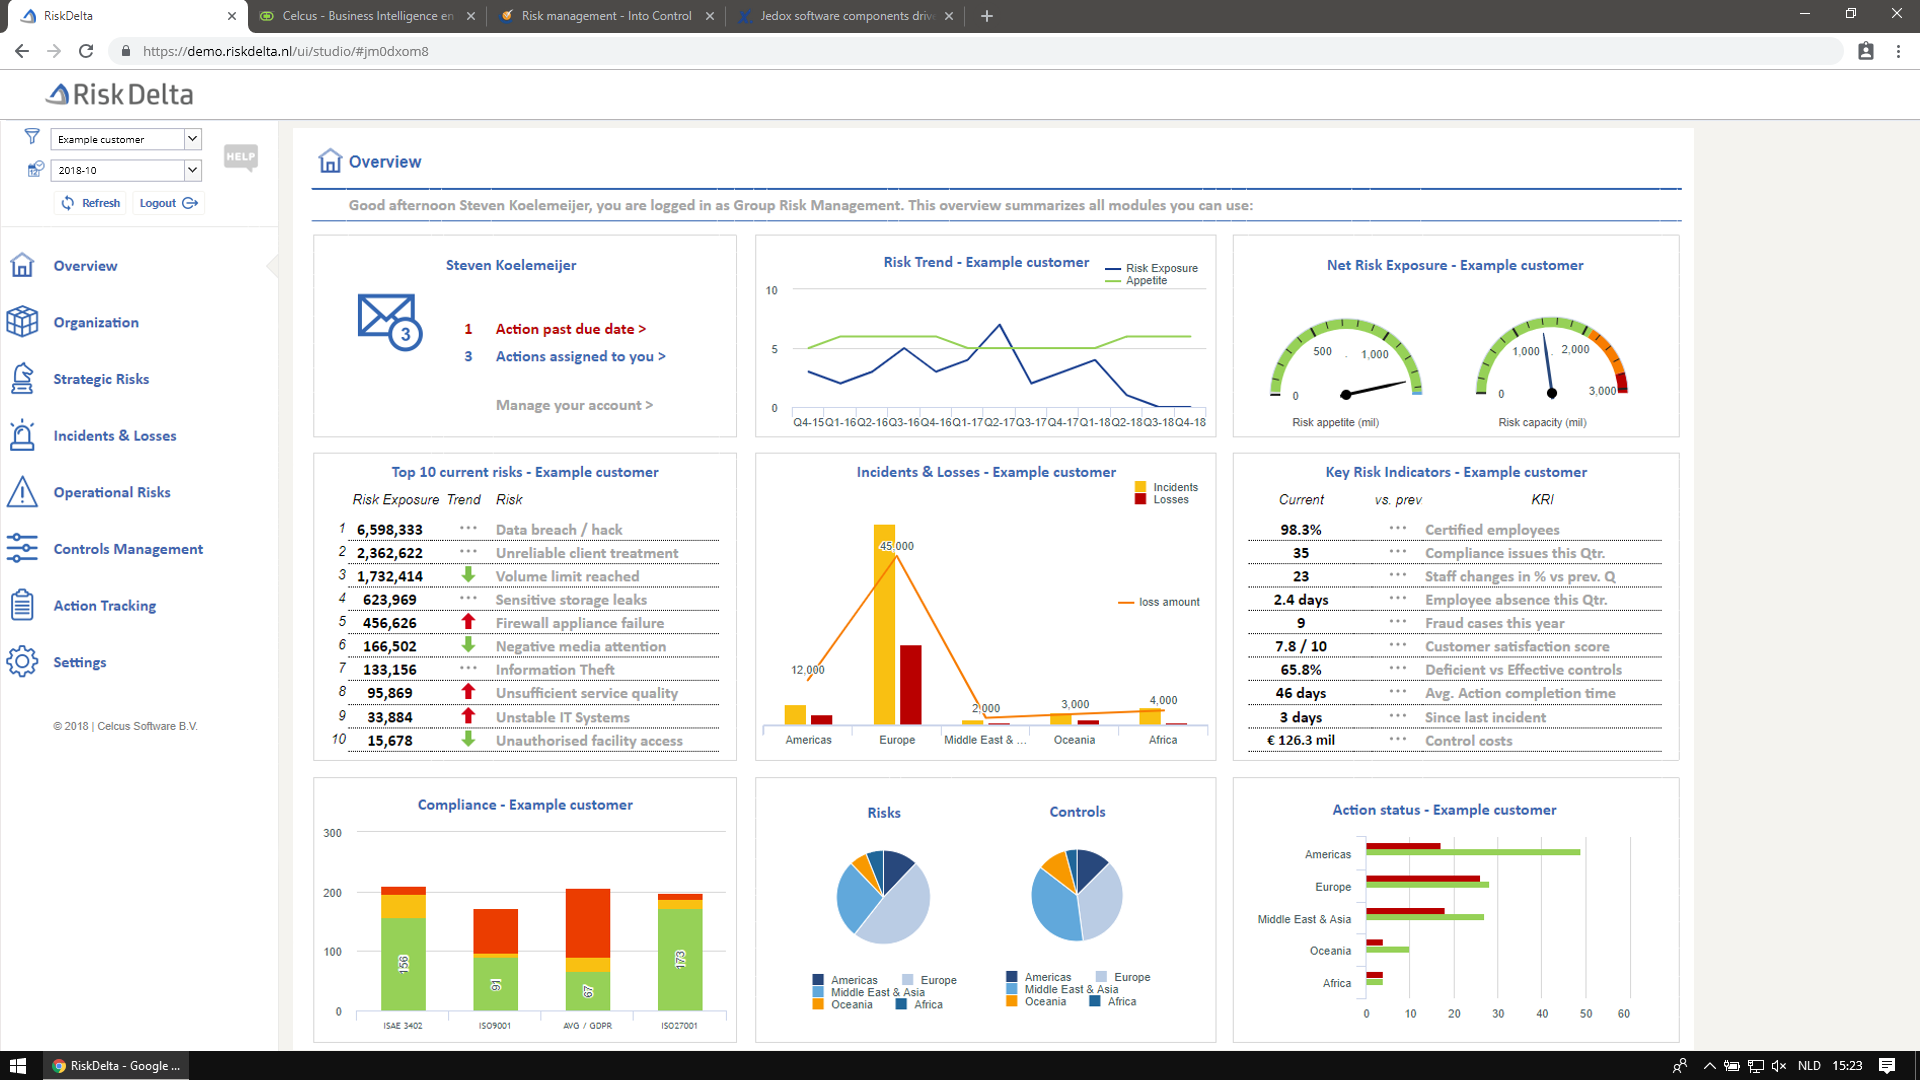 RiskDelta dashboard overview